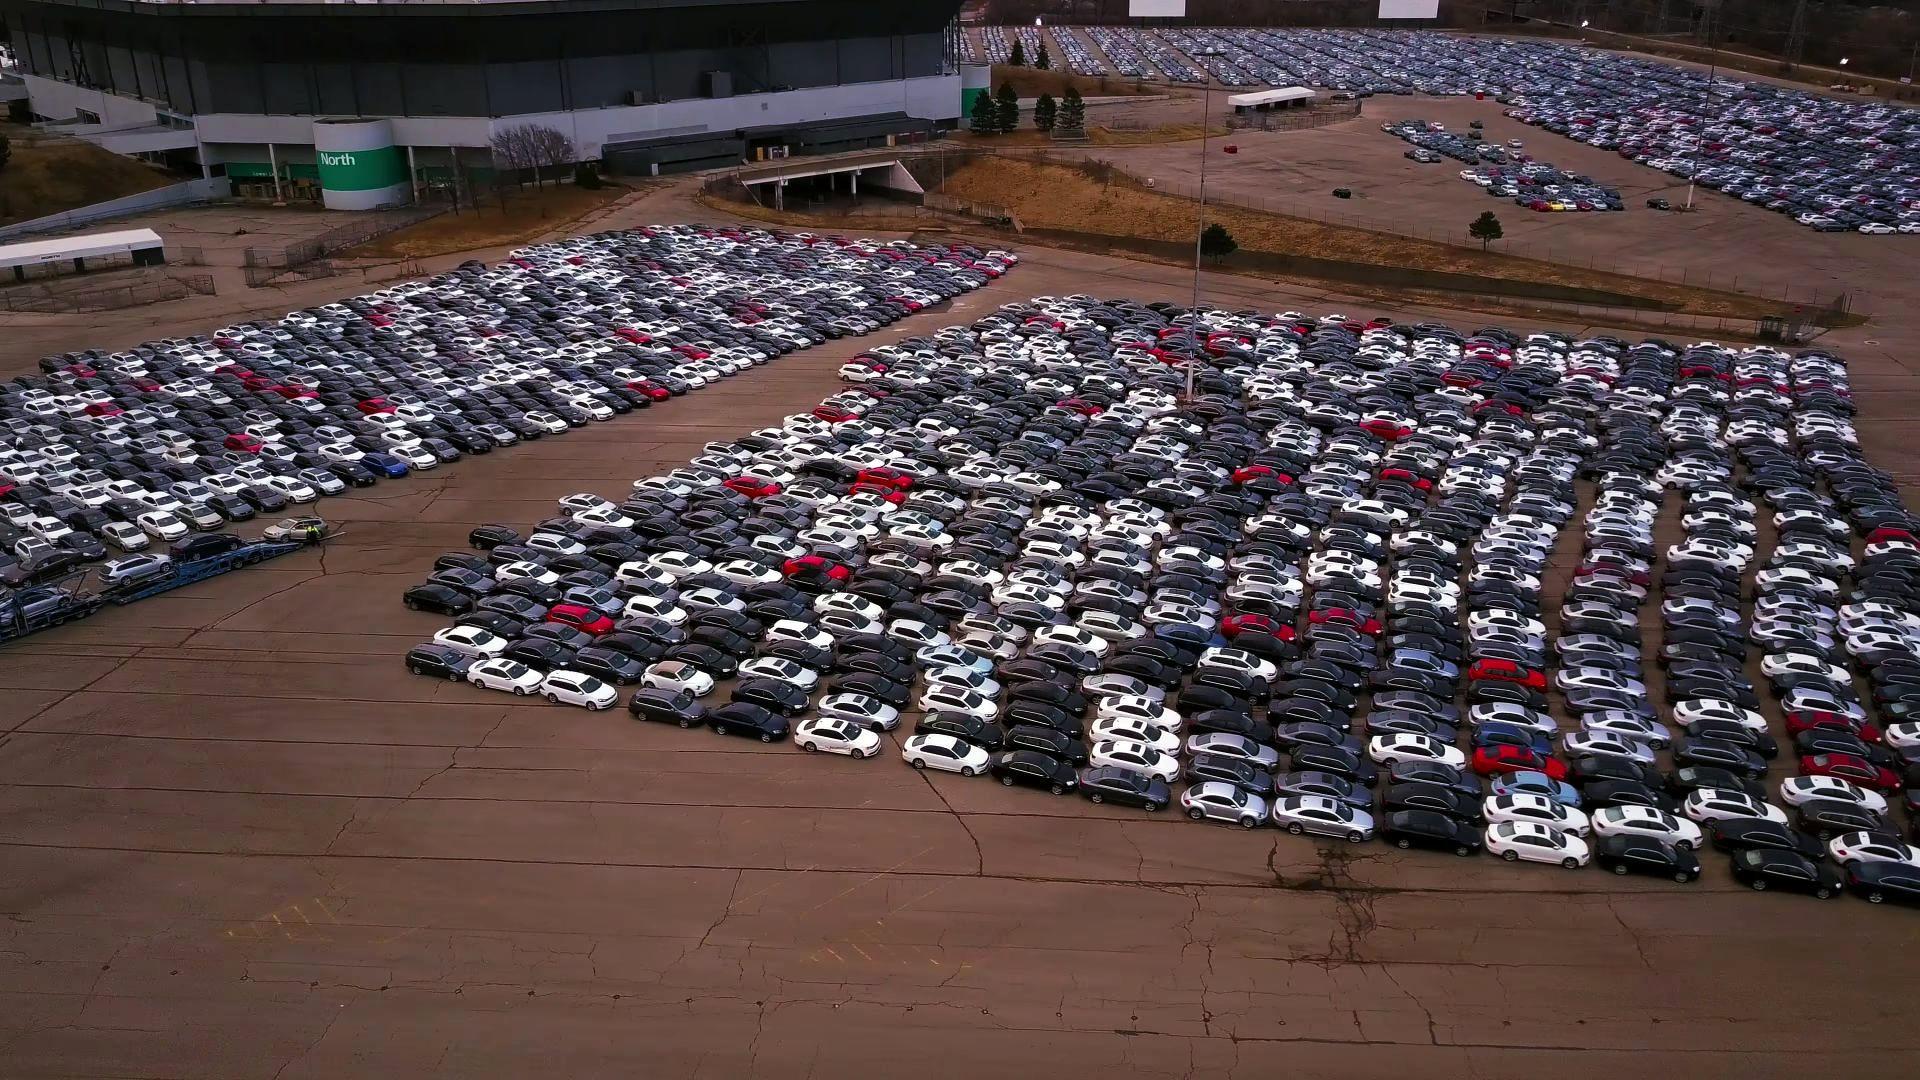 Volkswagen Audi Cars Stolen From Dieselgate Buyback Parking Lot